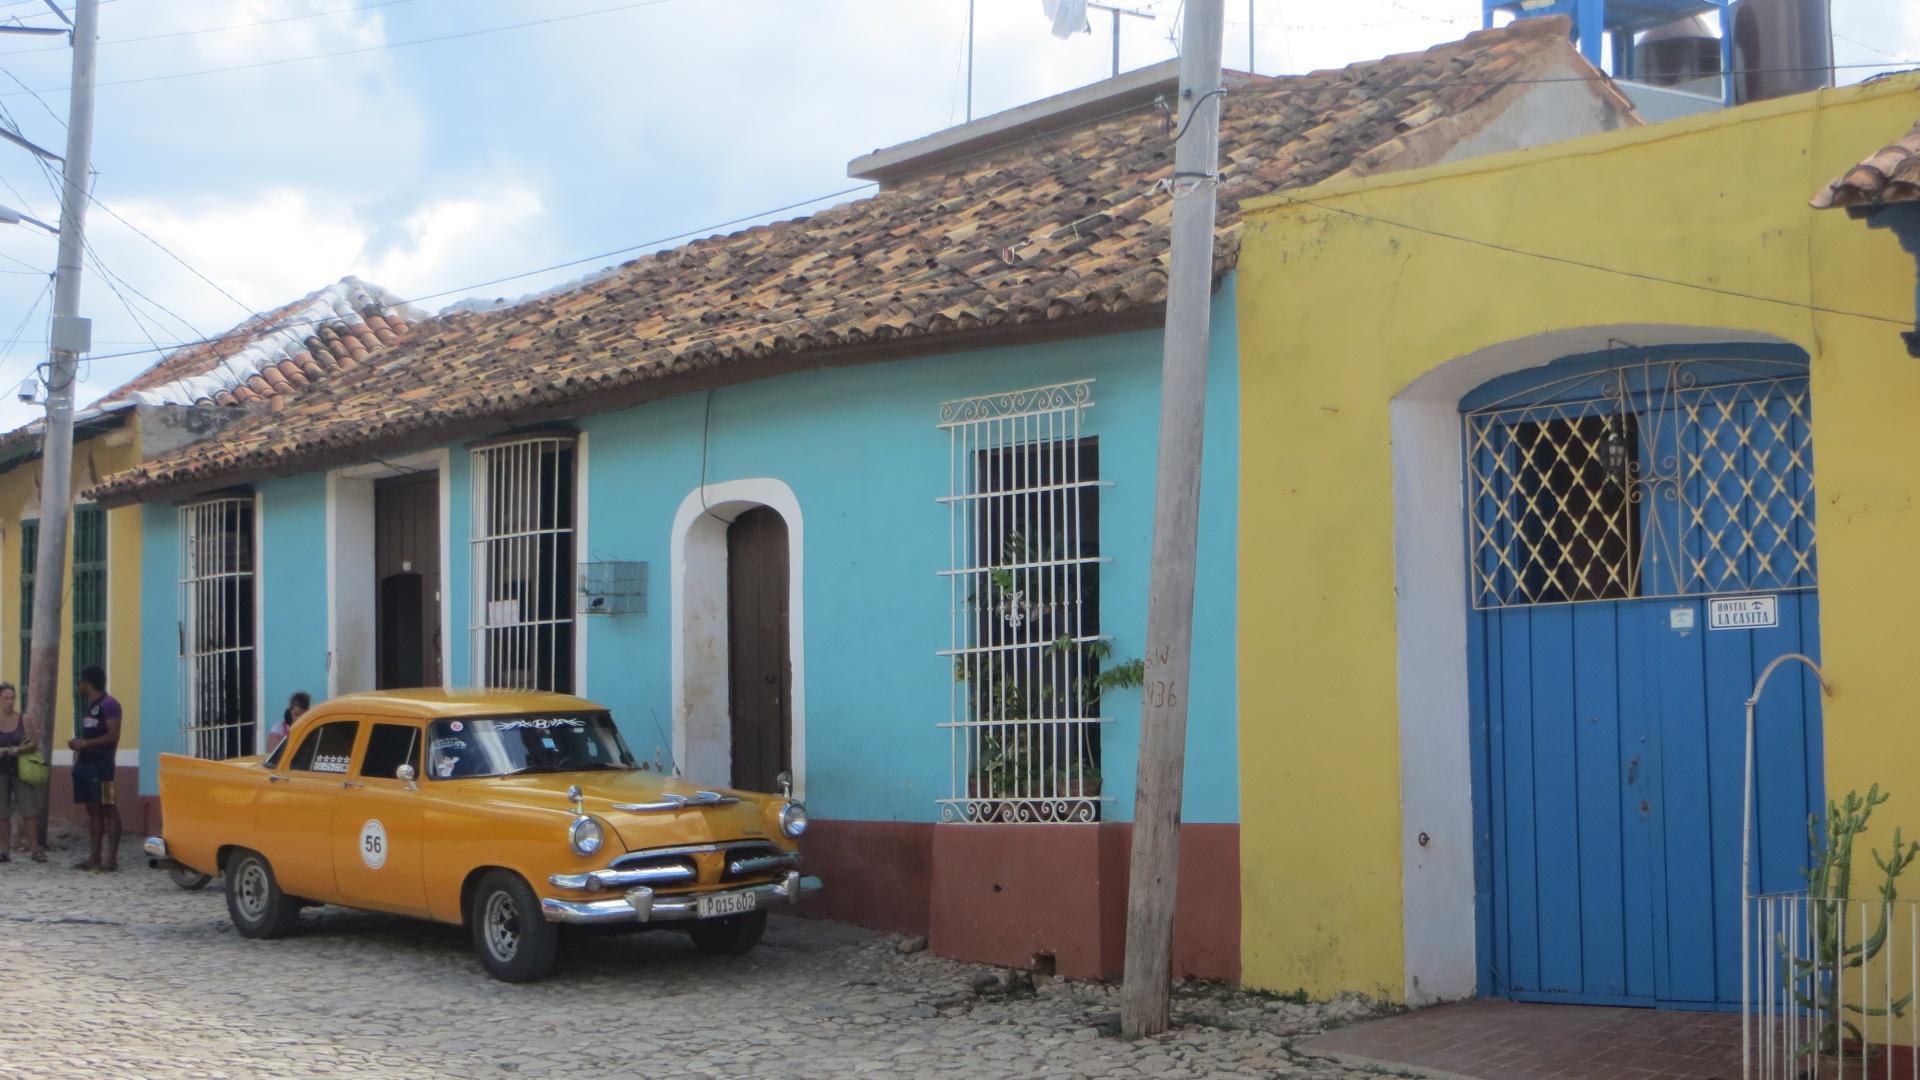 Kuba Trinidad IMG_1624